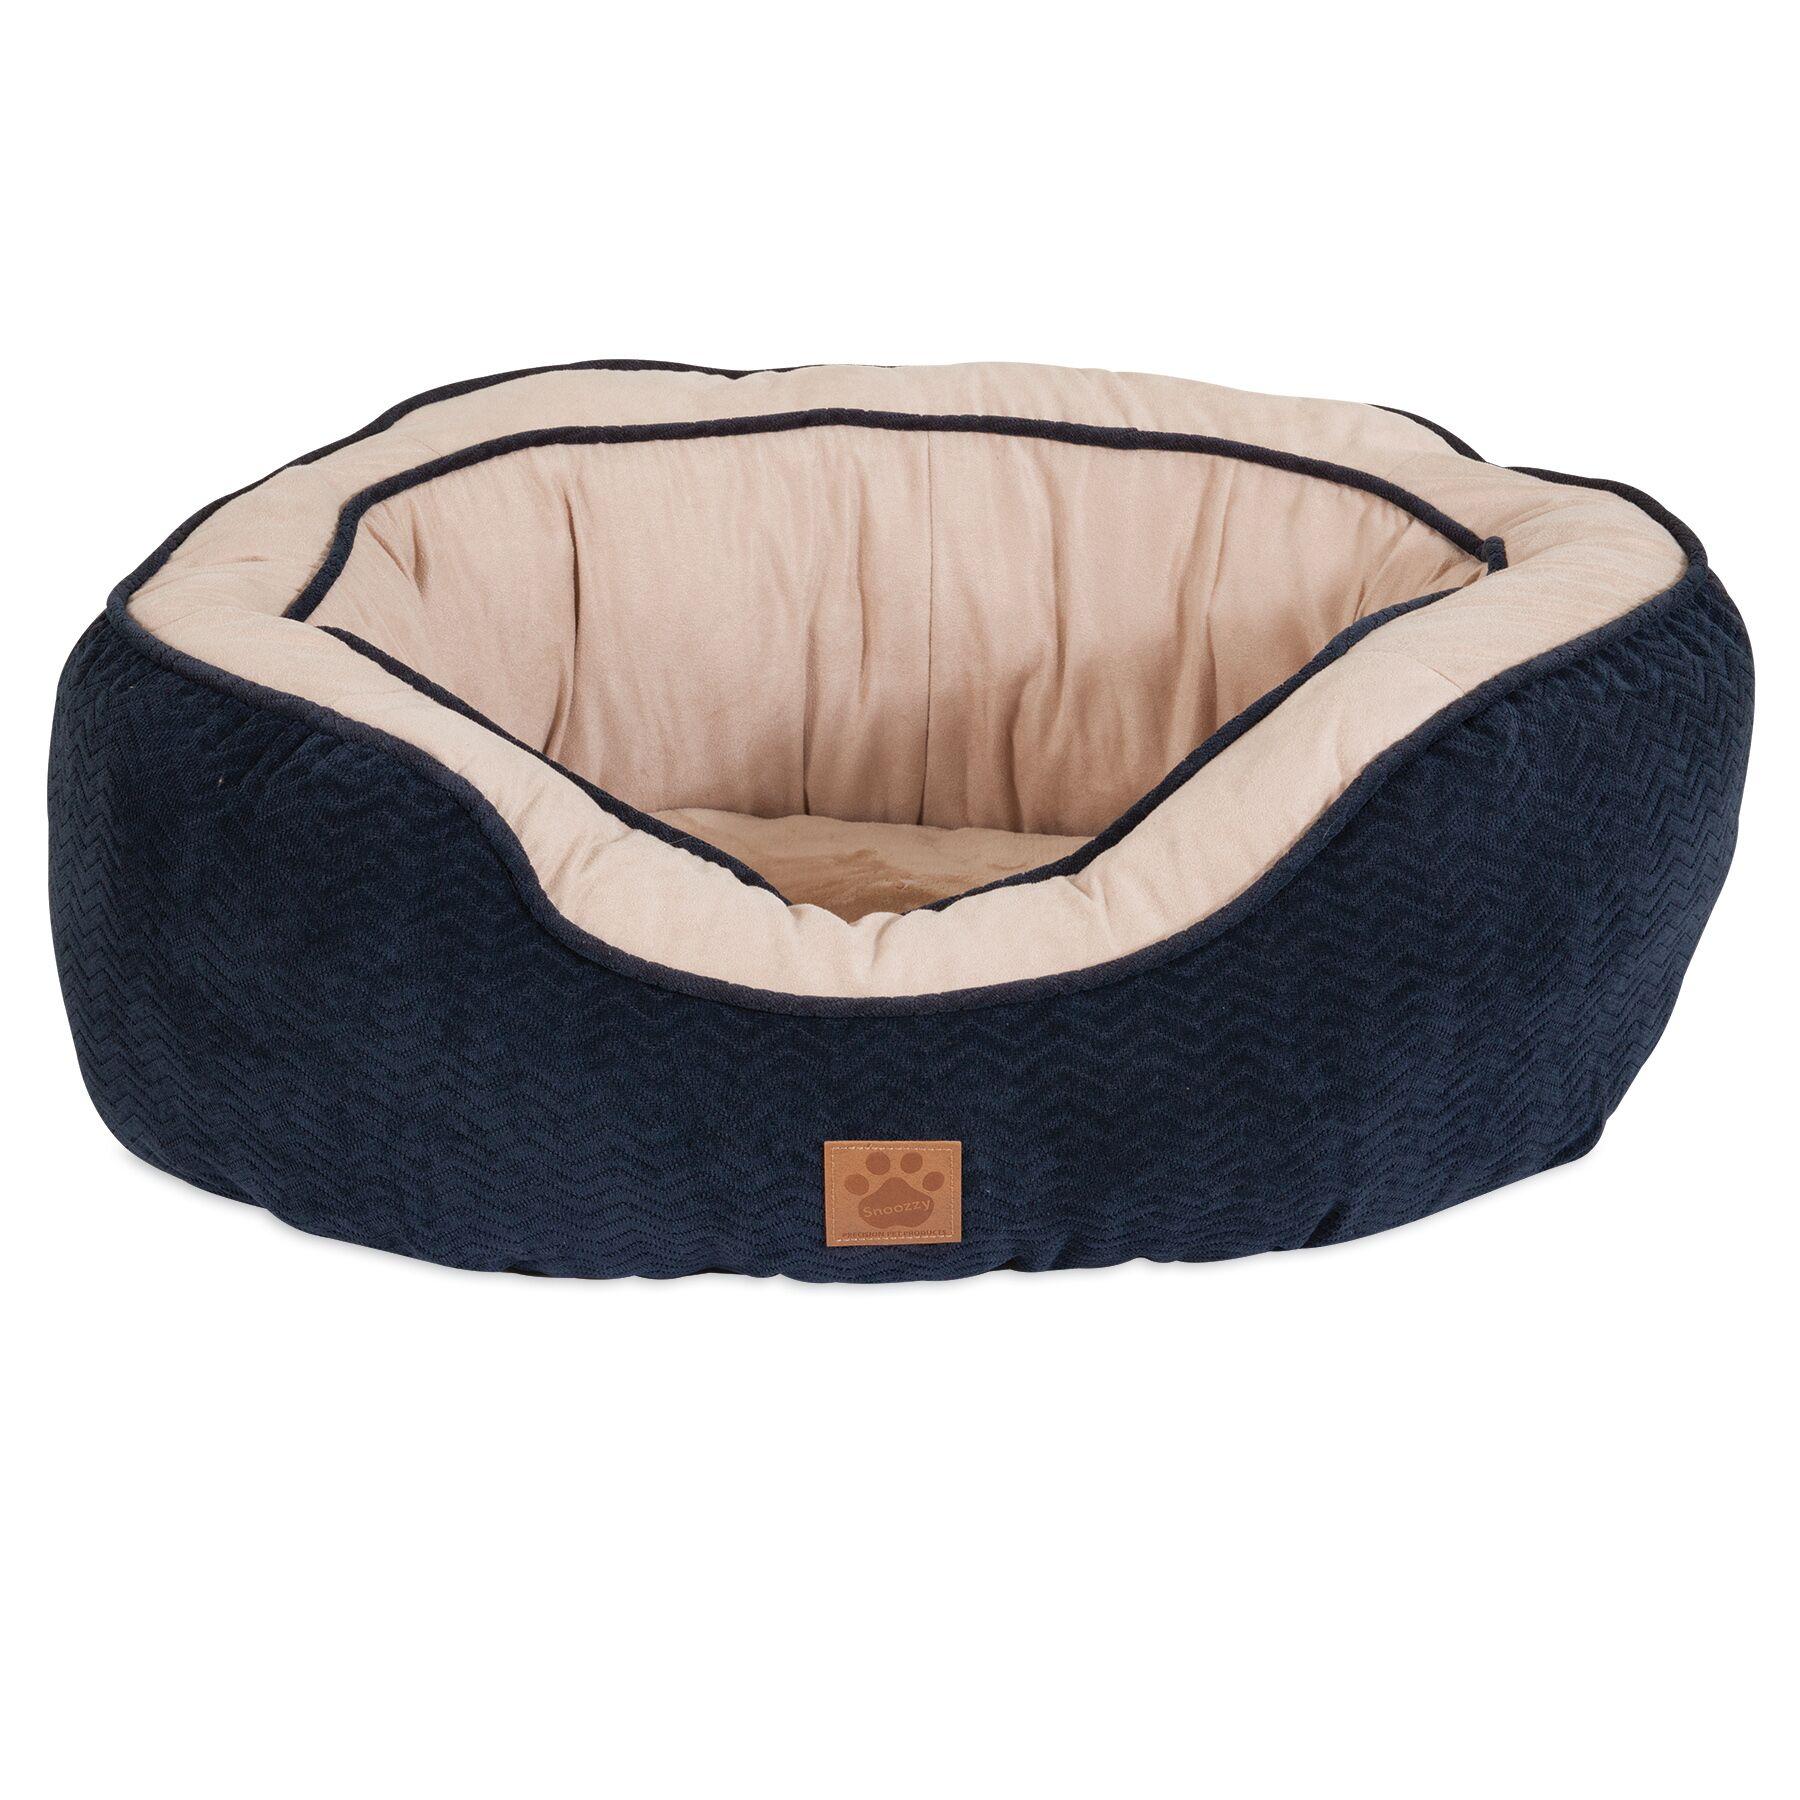 Corvus Chevron Gusset Daydreamer Bolster Dog Bed Size: 22